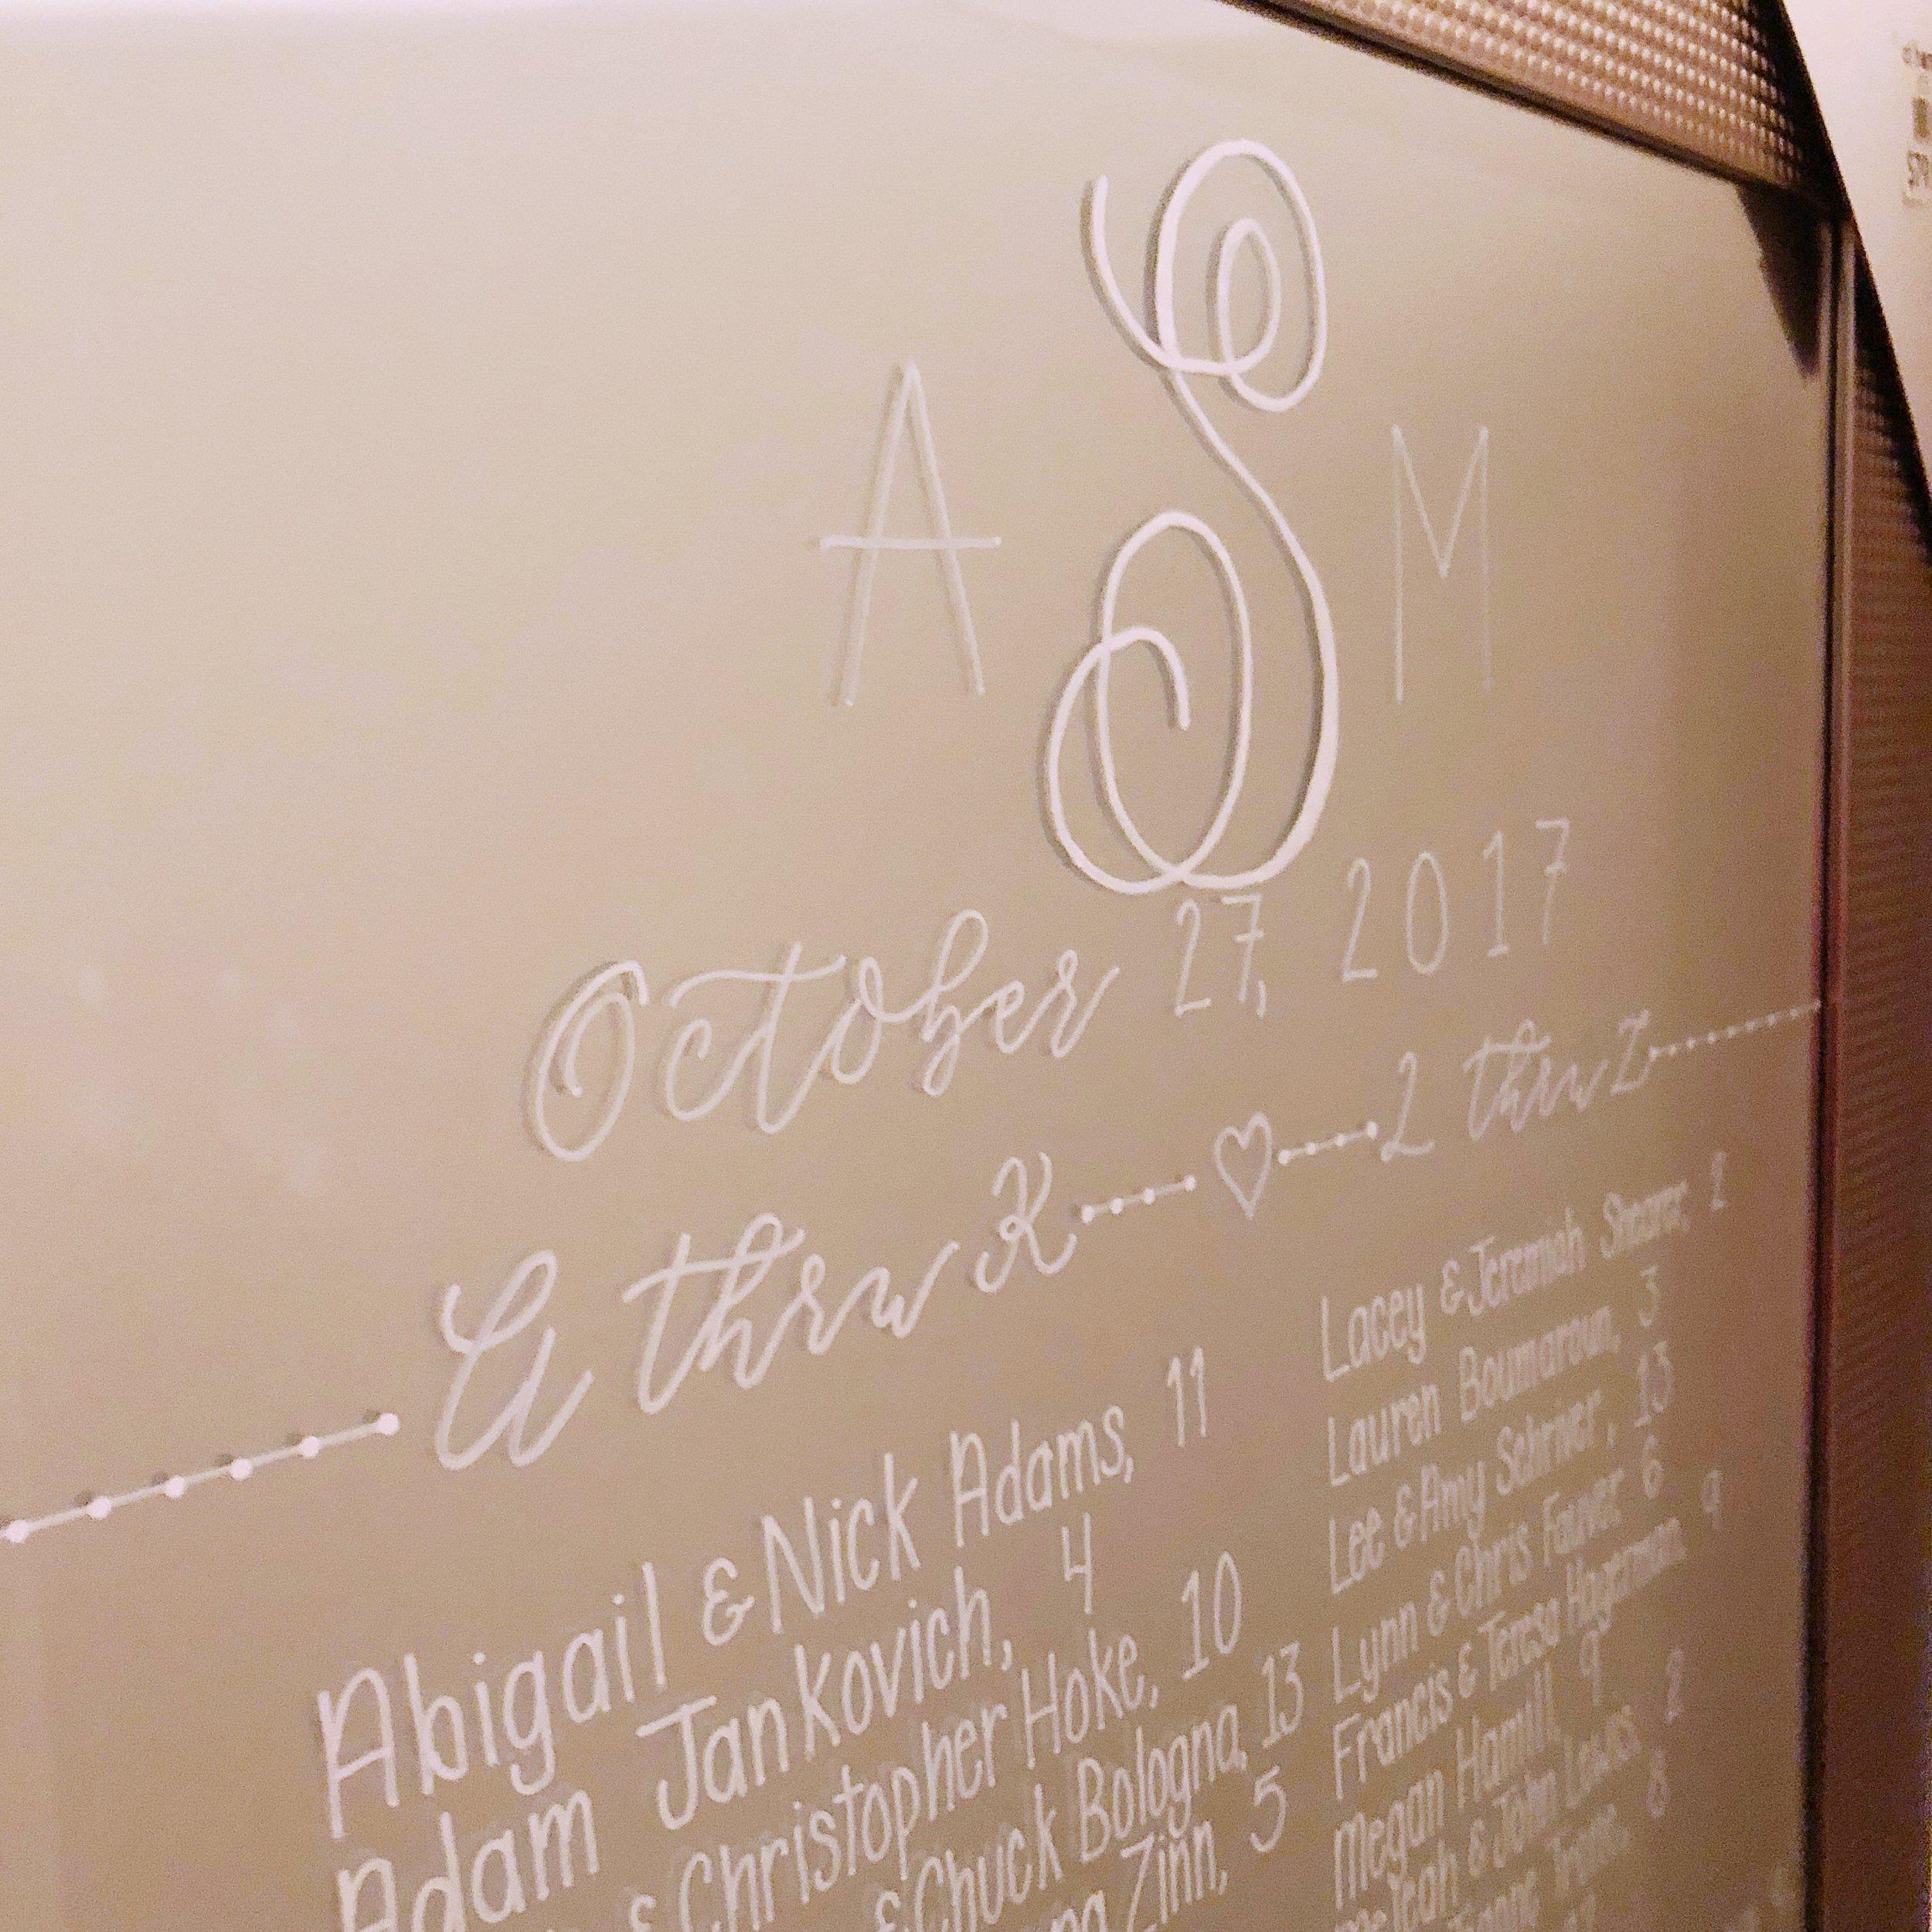 Central PA, York PA, JesSmith Designs, custom, wedding, invitations, bridal, announcements, save the date, birth, baby, motherhood, hanover, calligraphy, handlettering, wedding invitations, lancaster, gettysburg-10-23 22.19.19.jpg